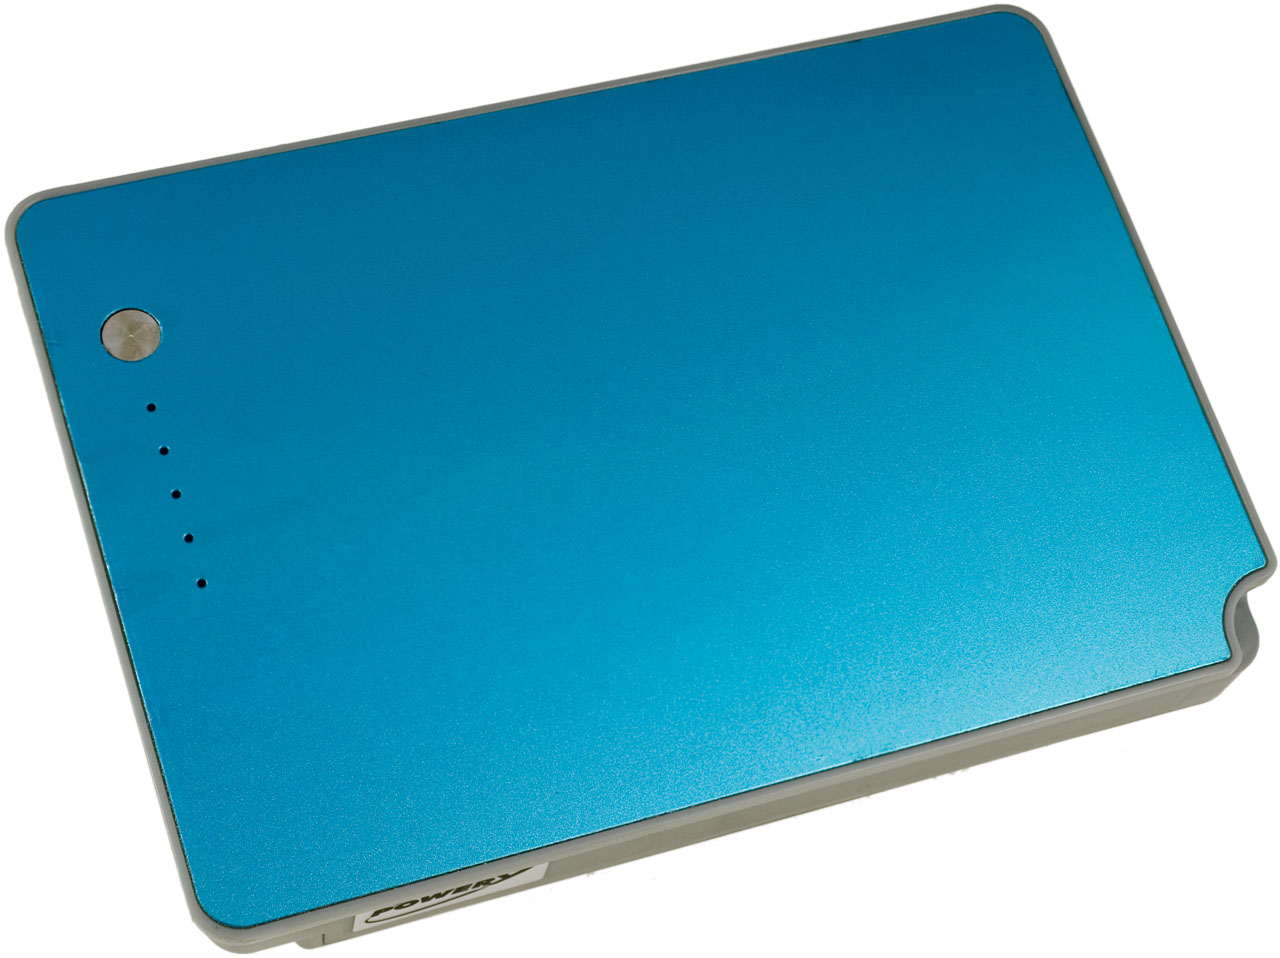 Akku zu Apple PowerBook Super Drive M9422LL/A